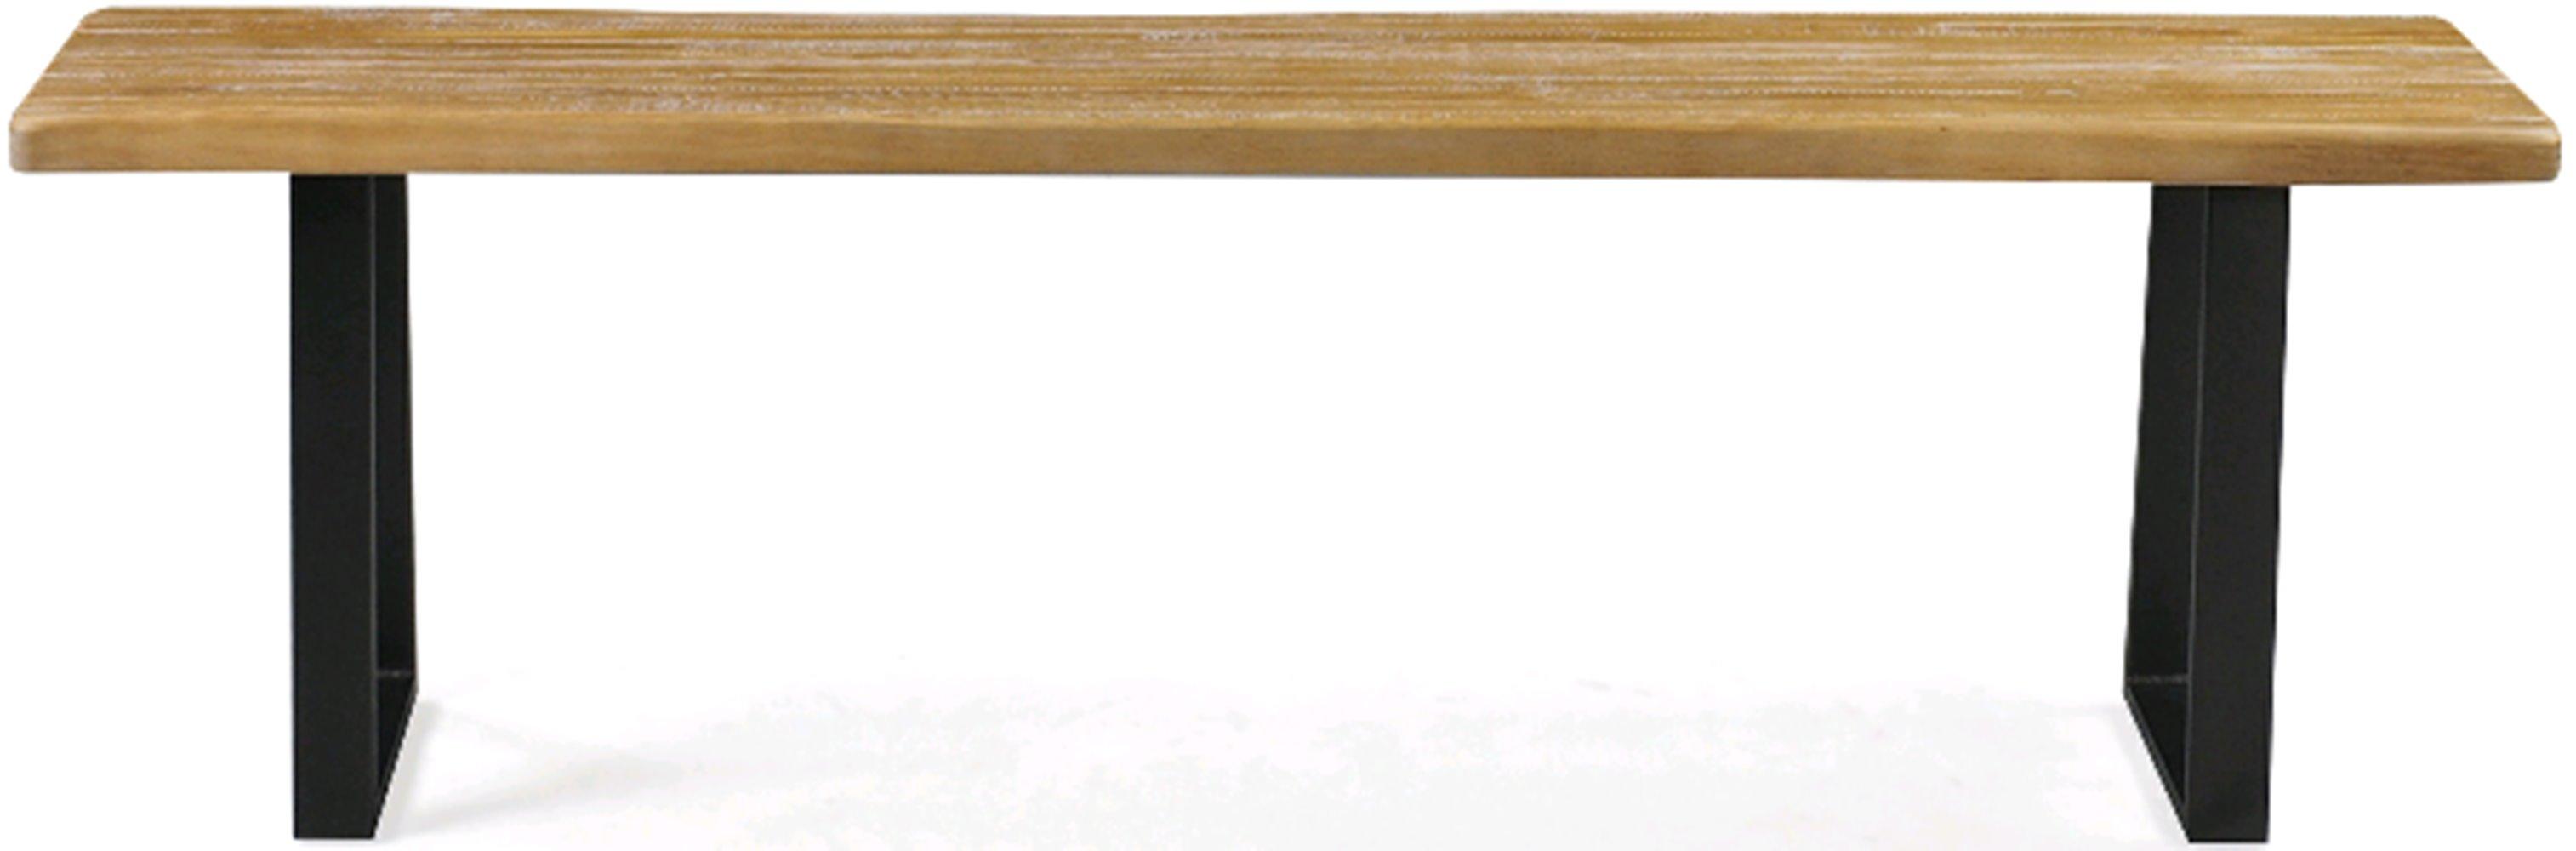 Banco Boston Metal Grafite Driftwood 1,90 MT (LARG) - 46220